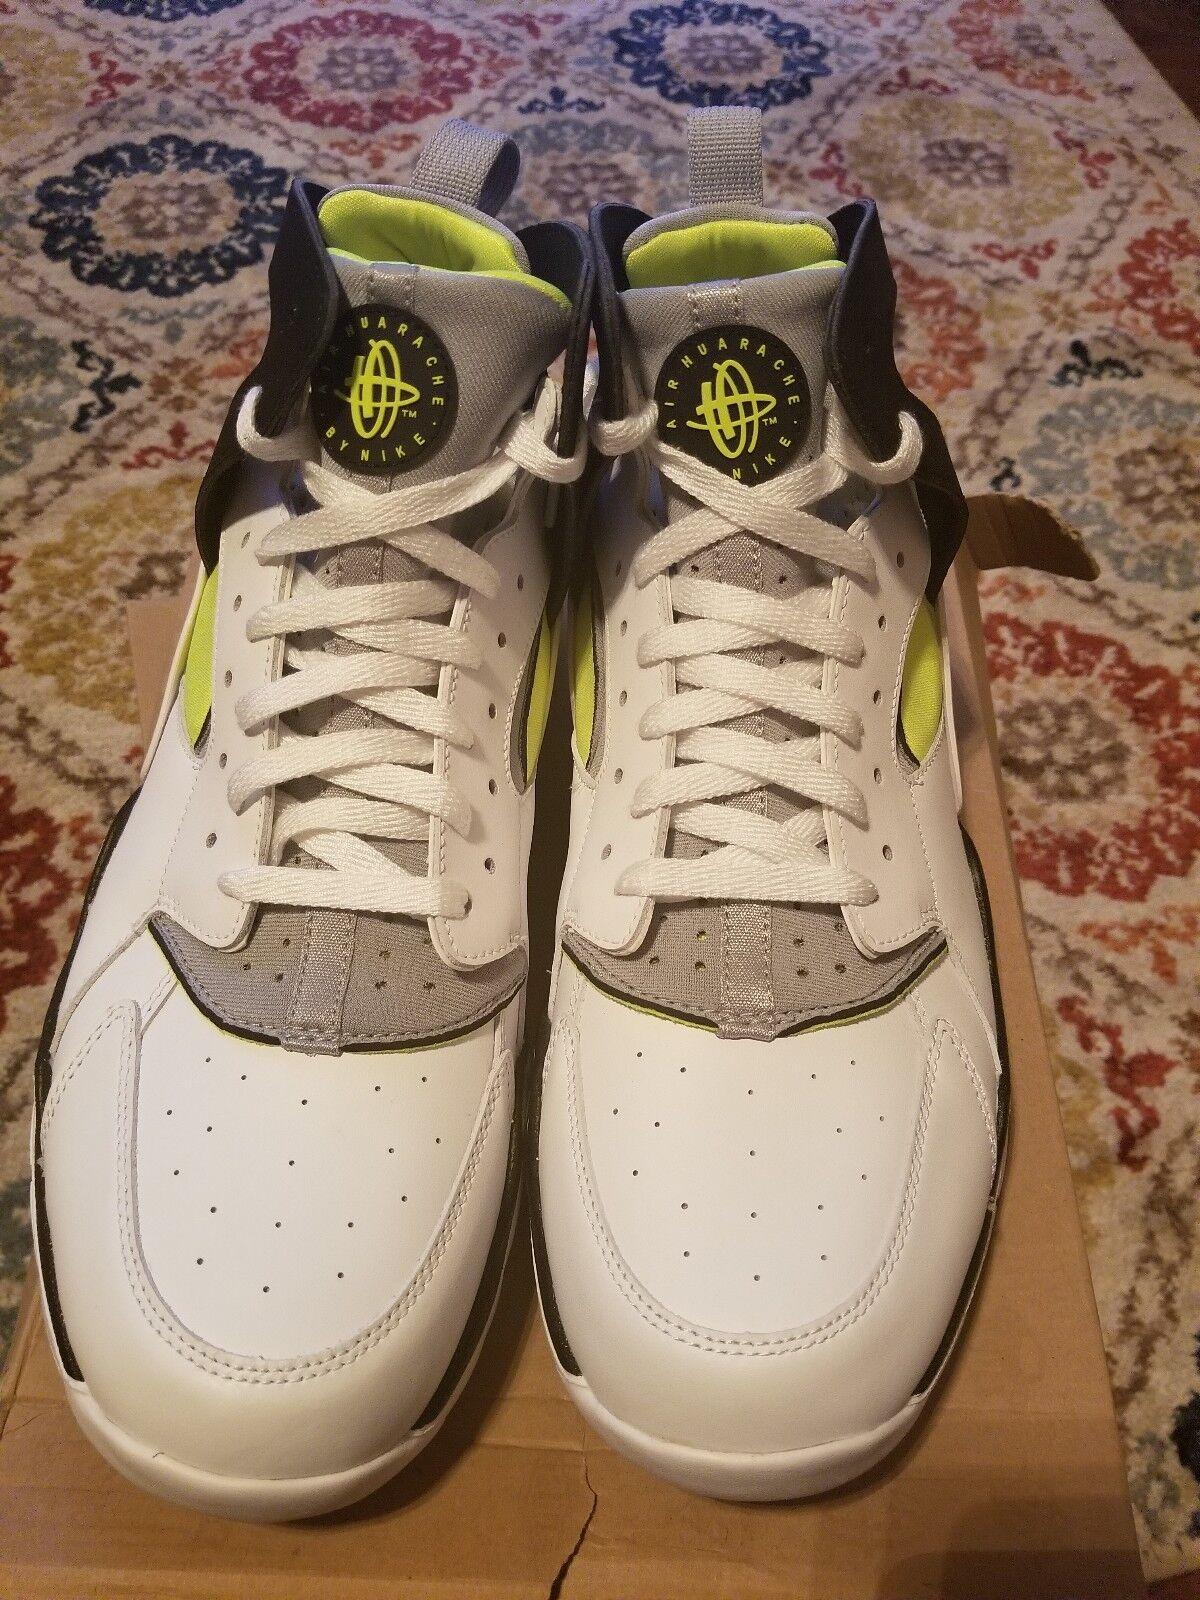 Nike Air Huarache Basketball Edition 488054-100 White/Black Volt Size 12